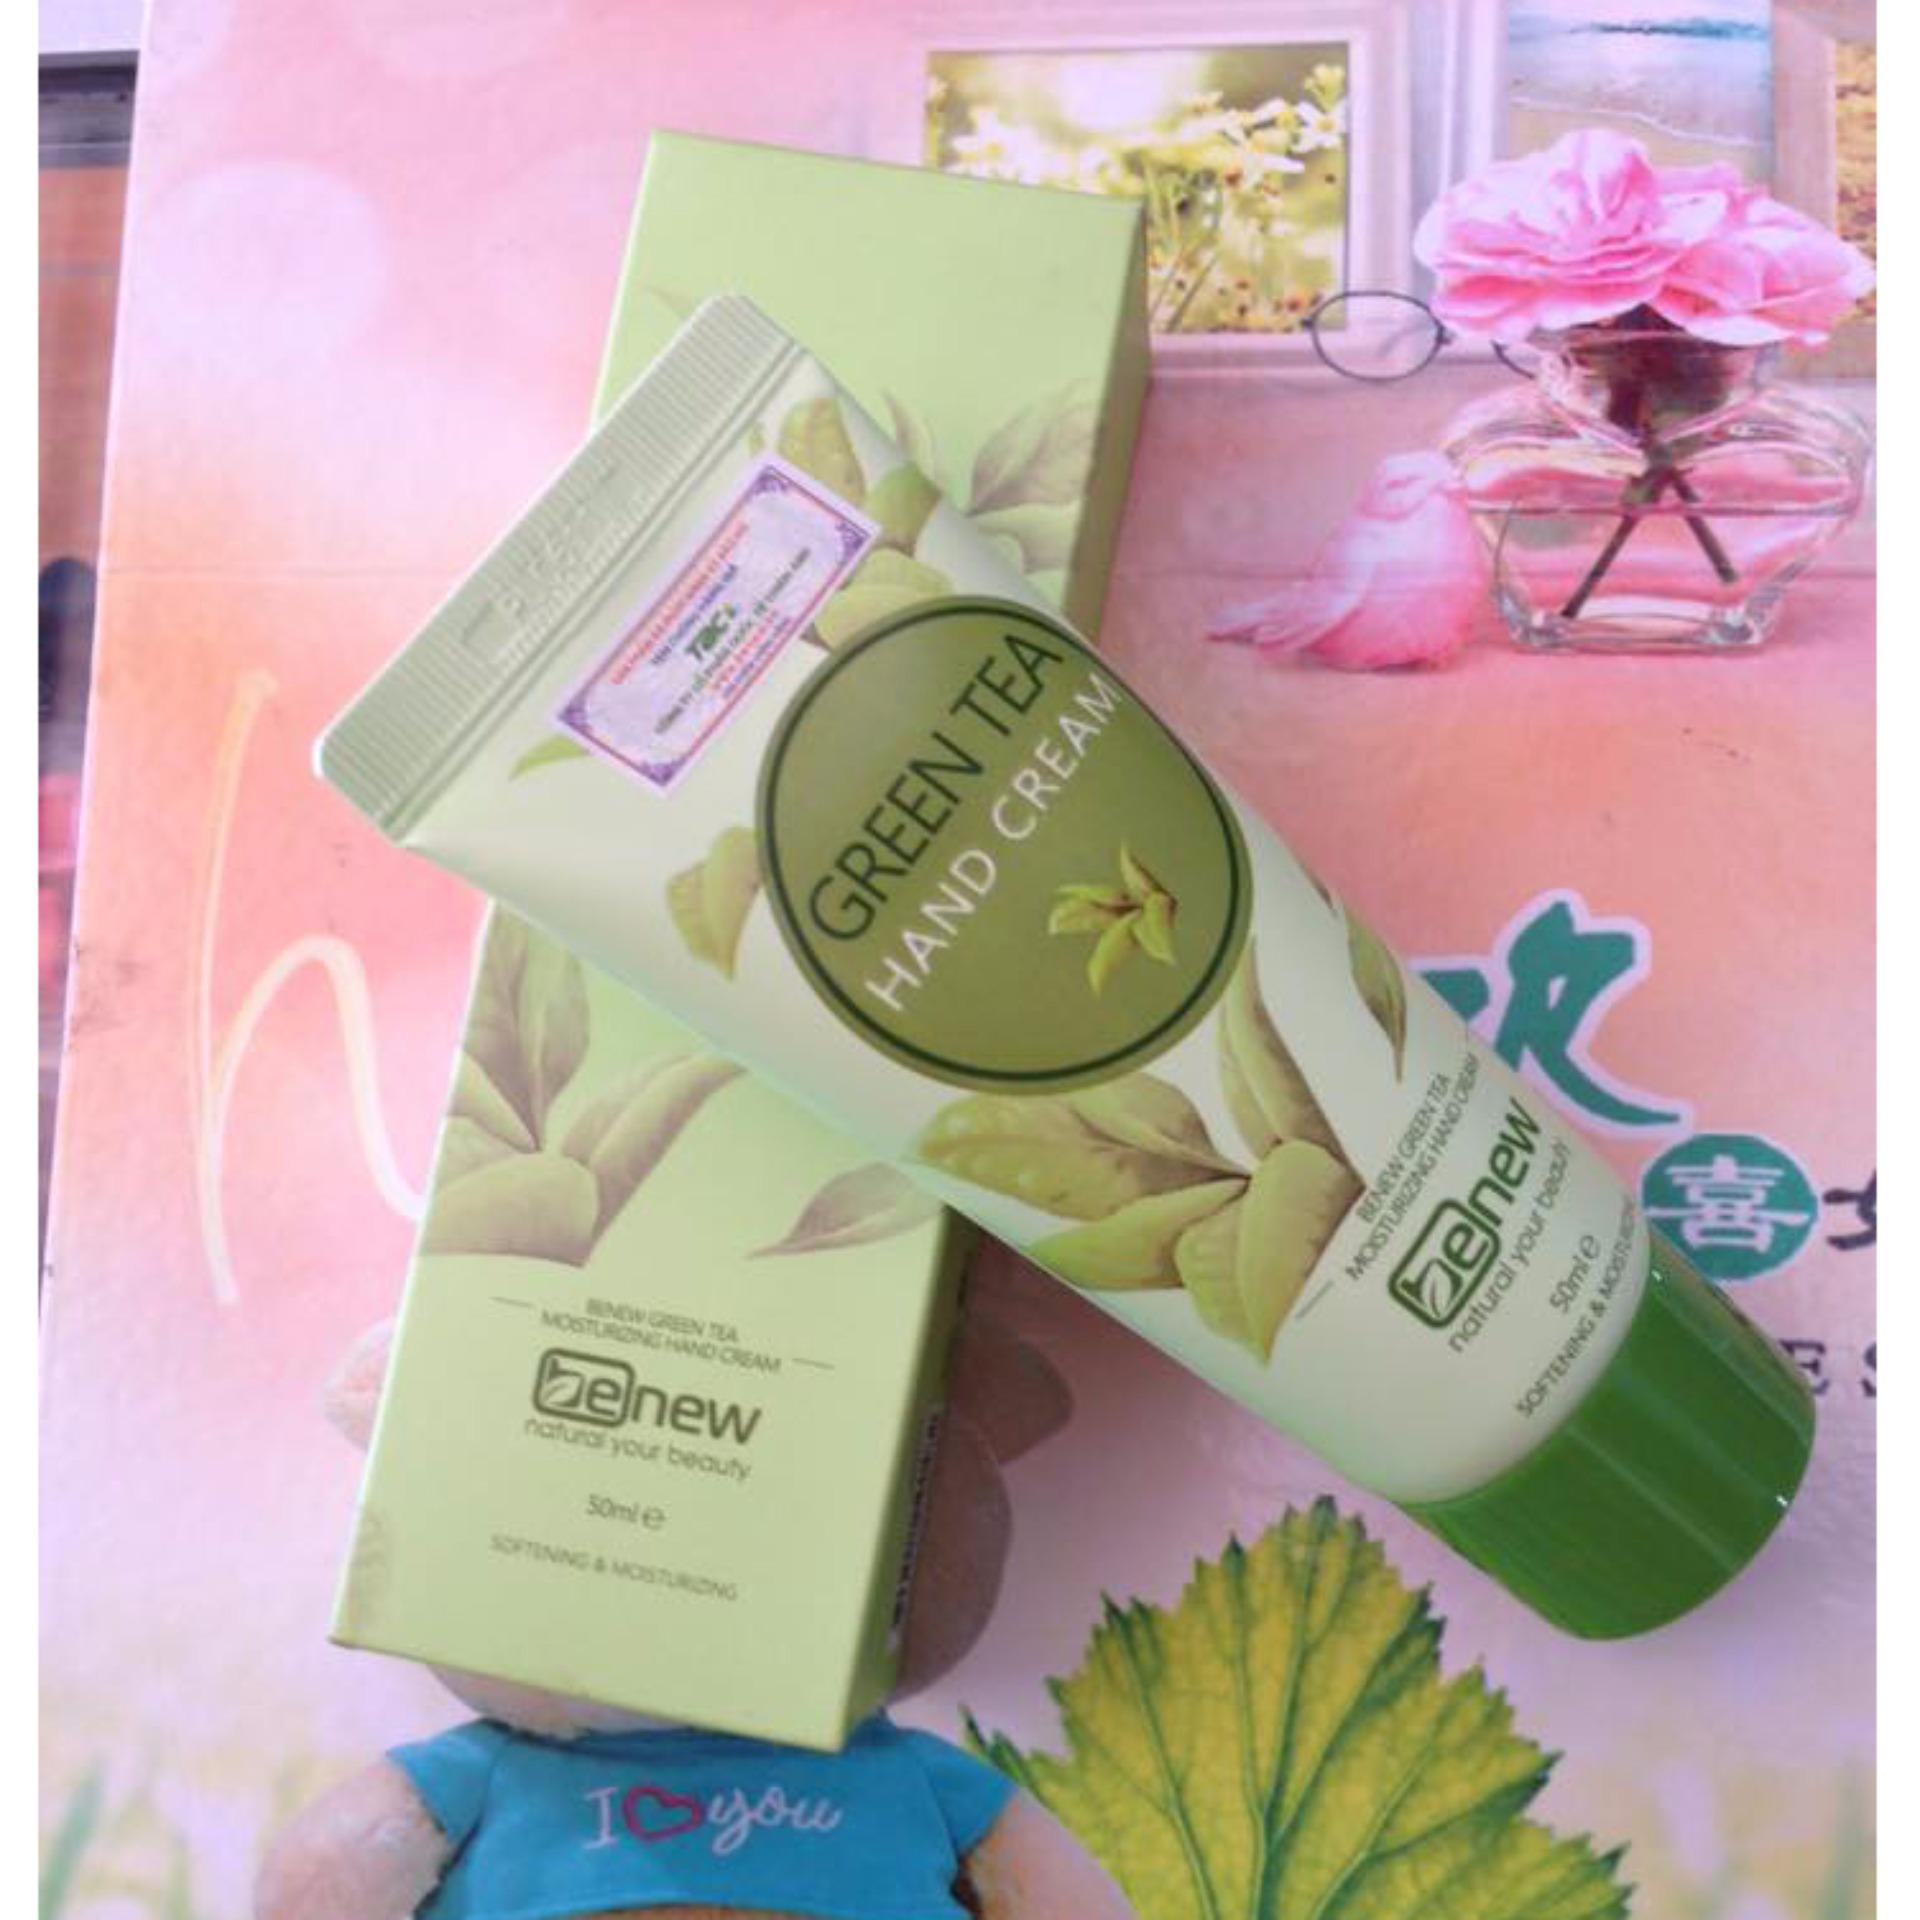 Benew Green Tea Hand Cream review